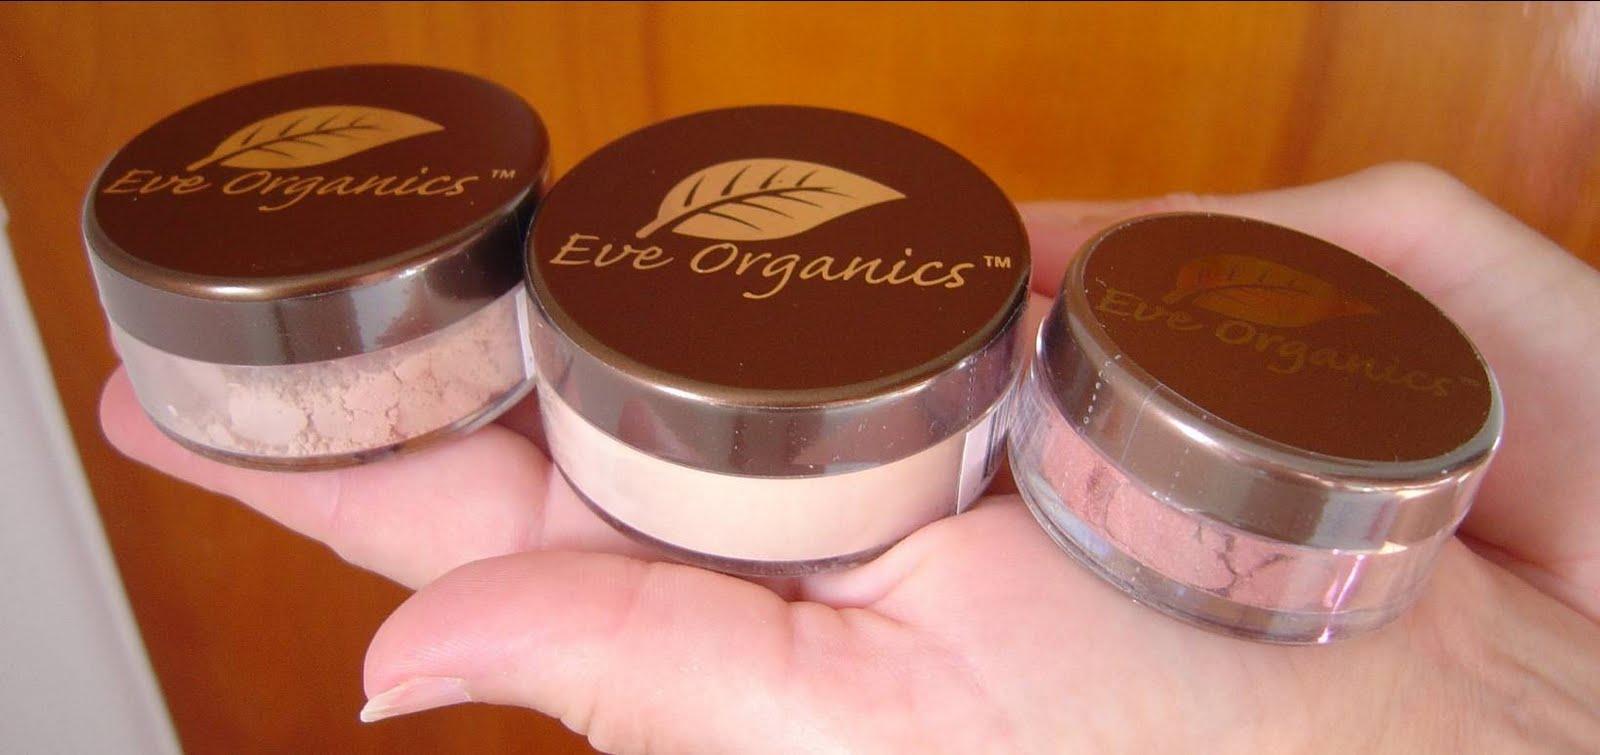 Eve Organics Mineral Makeup